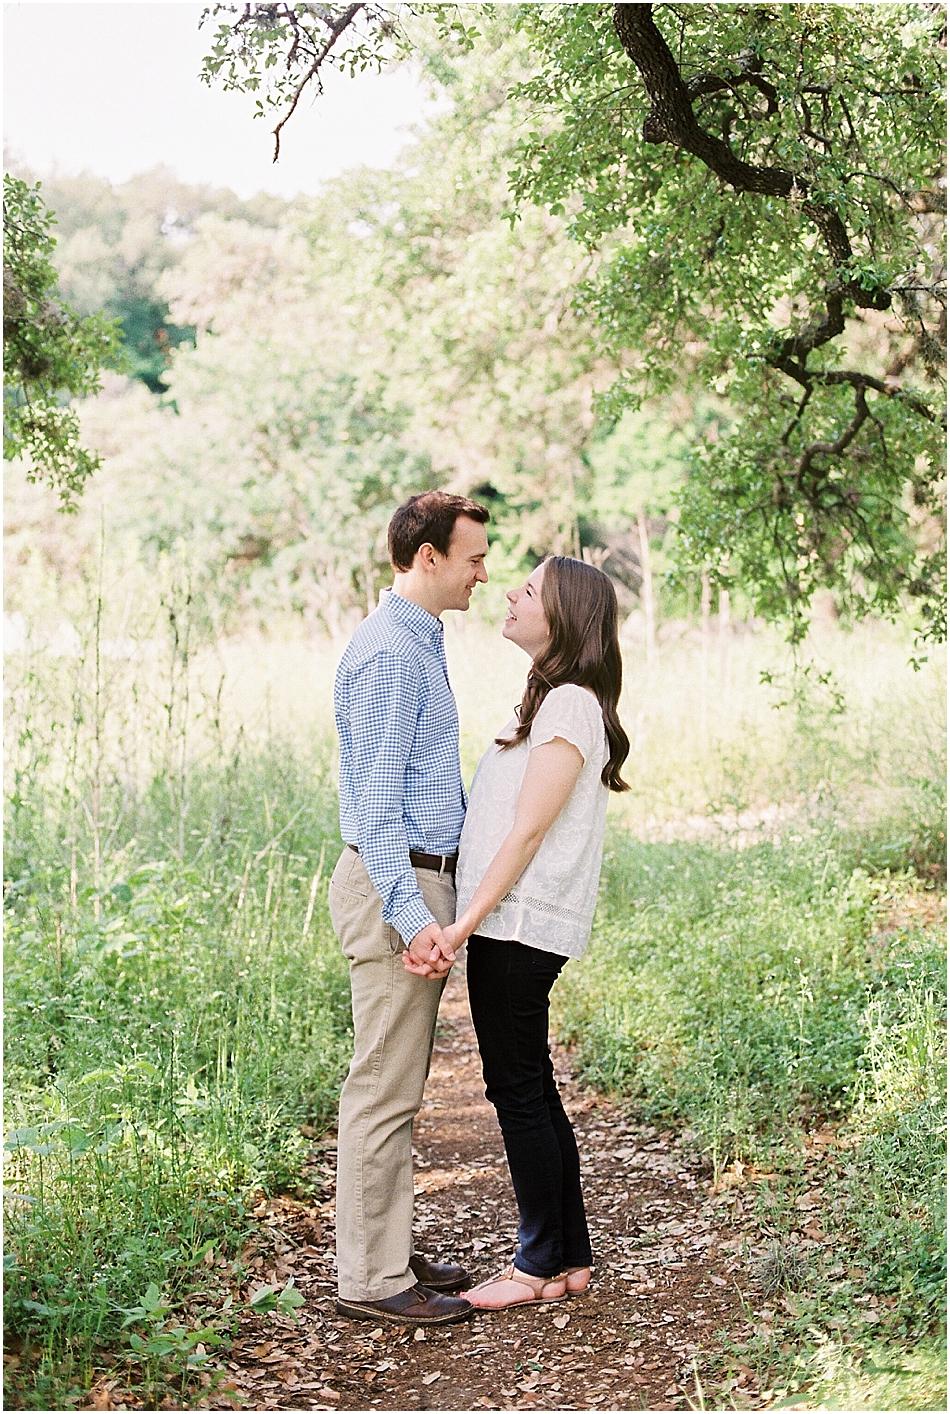 Laura + Nick | Engagement | Fine Art Film | Austin Texas | Emilie Anne Photography-18.jpg